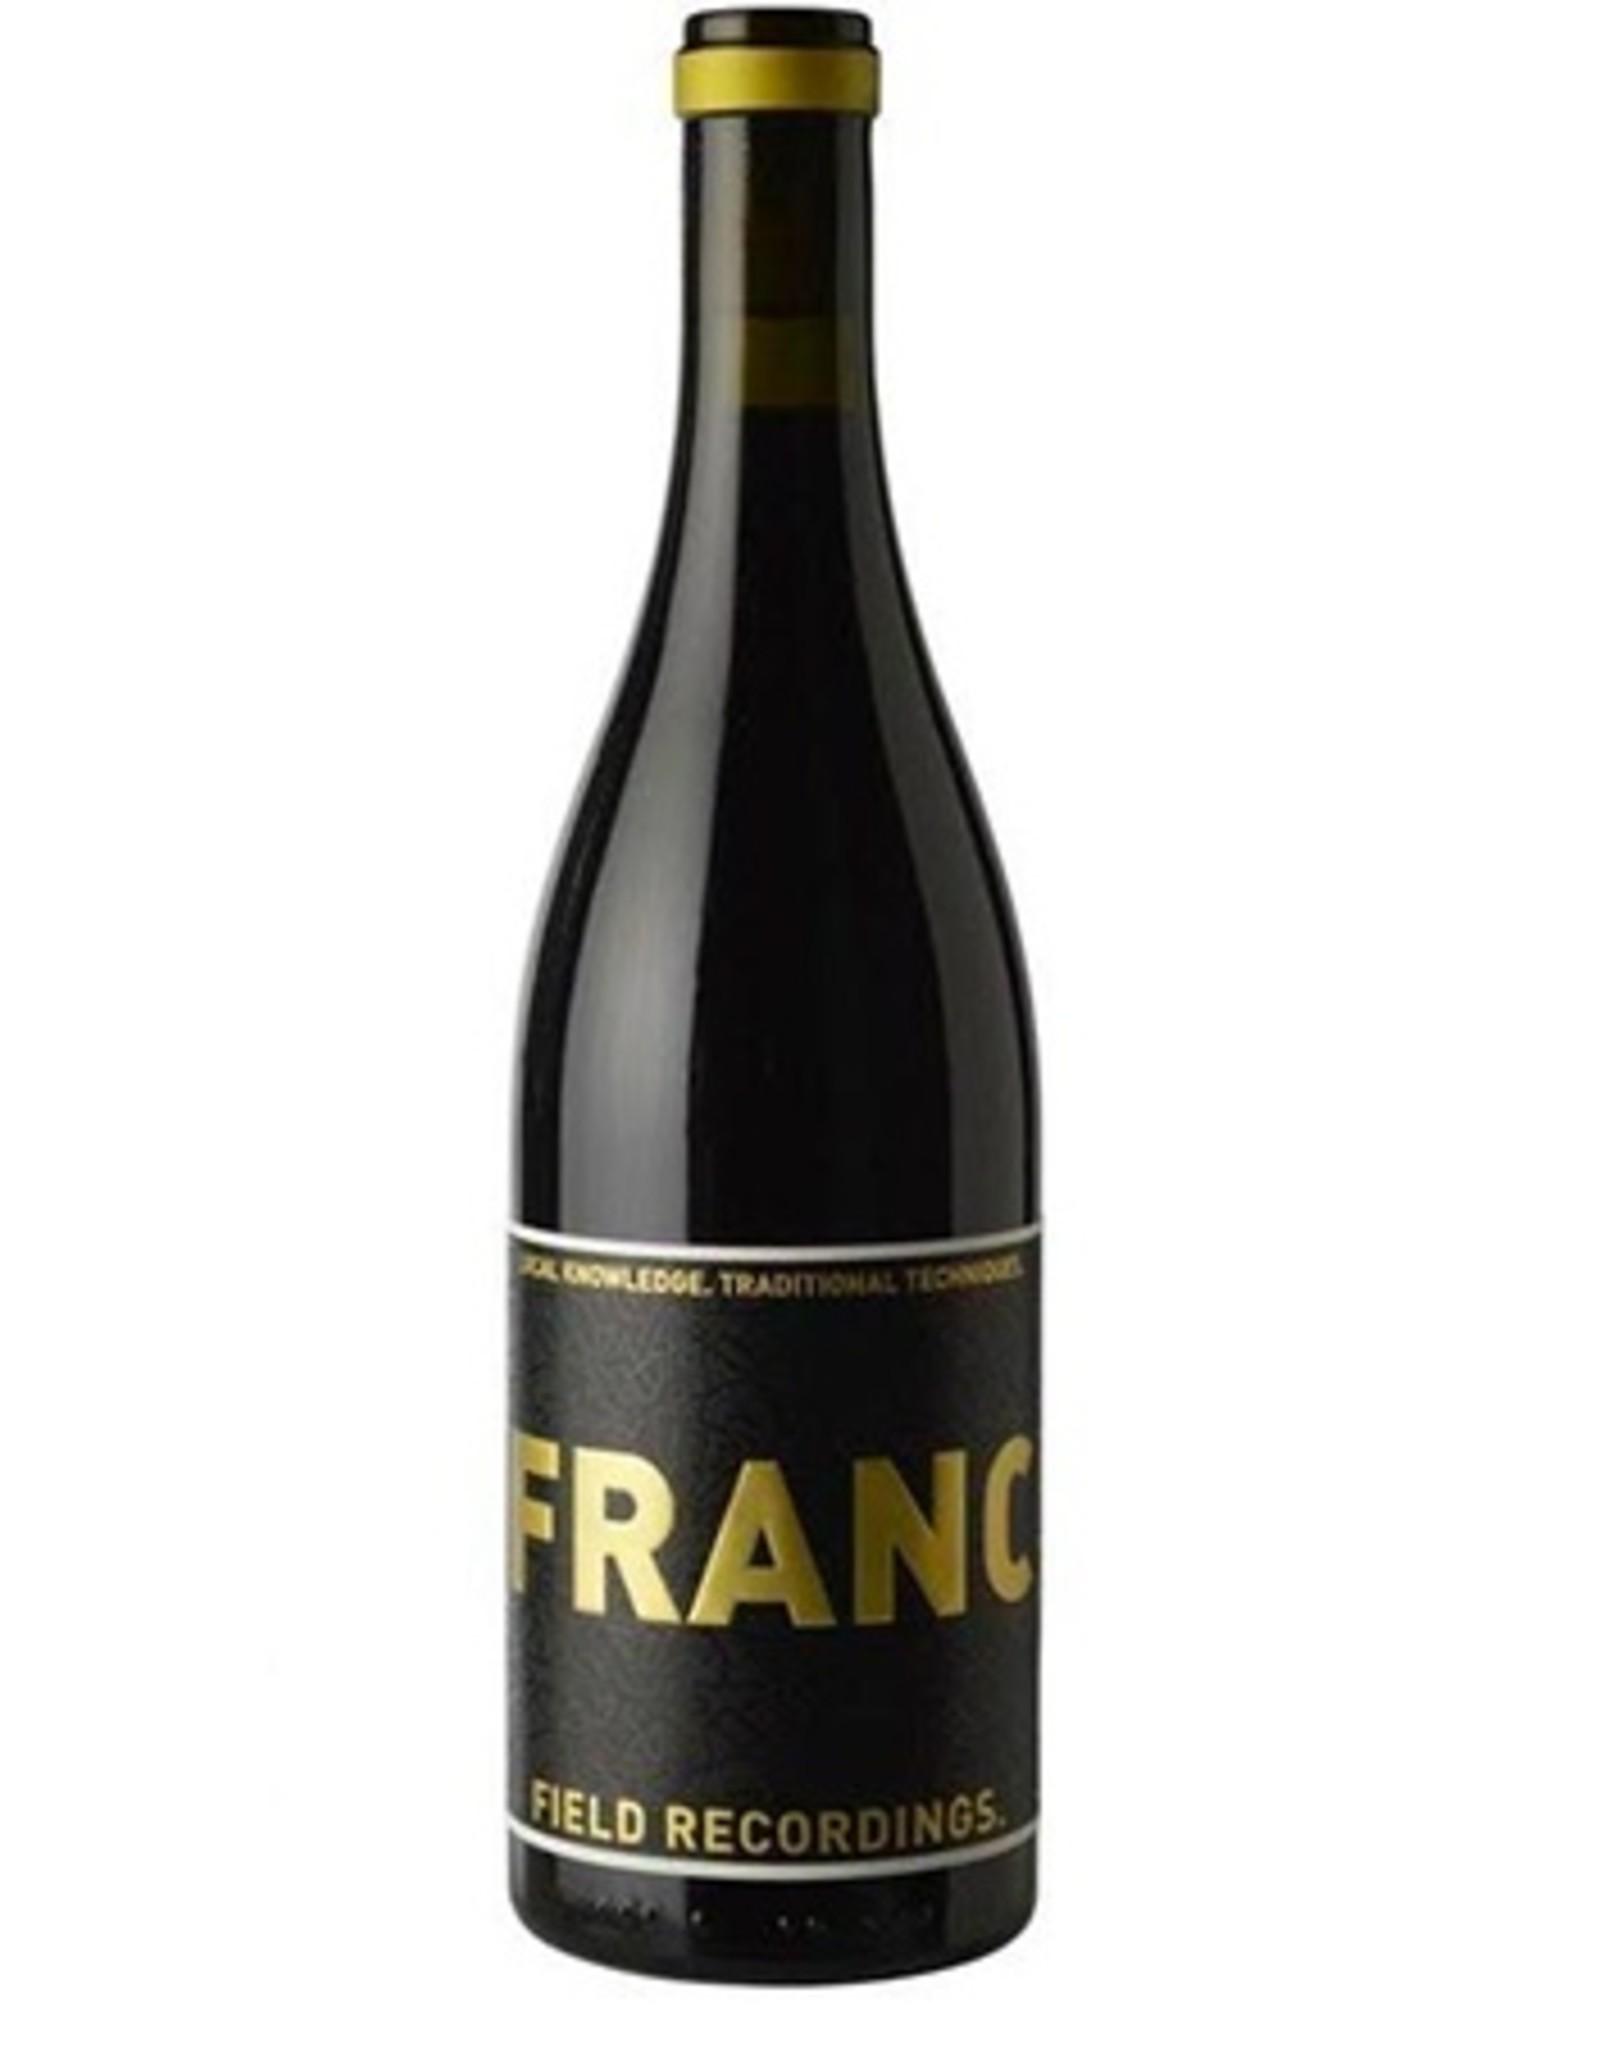 Field Recordings FRANC Cabernet Franc 2017